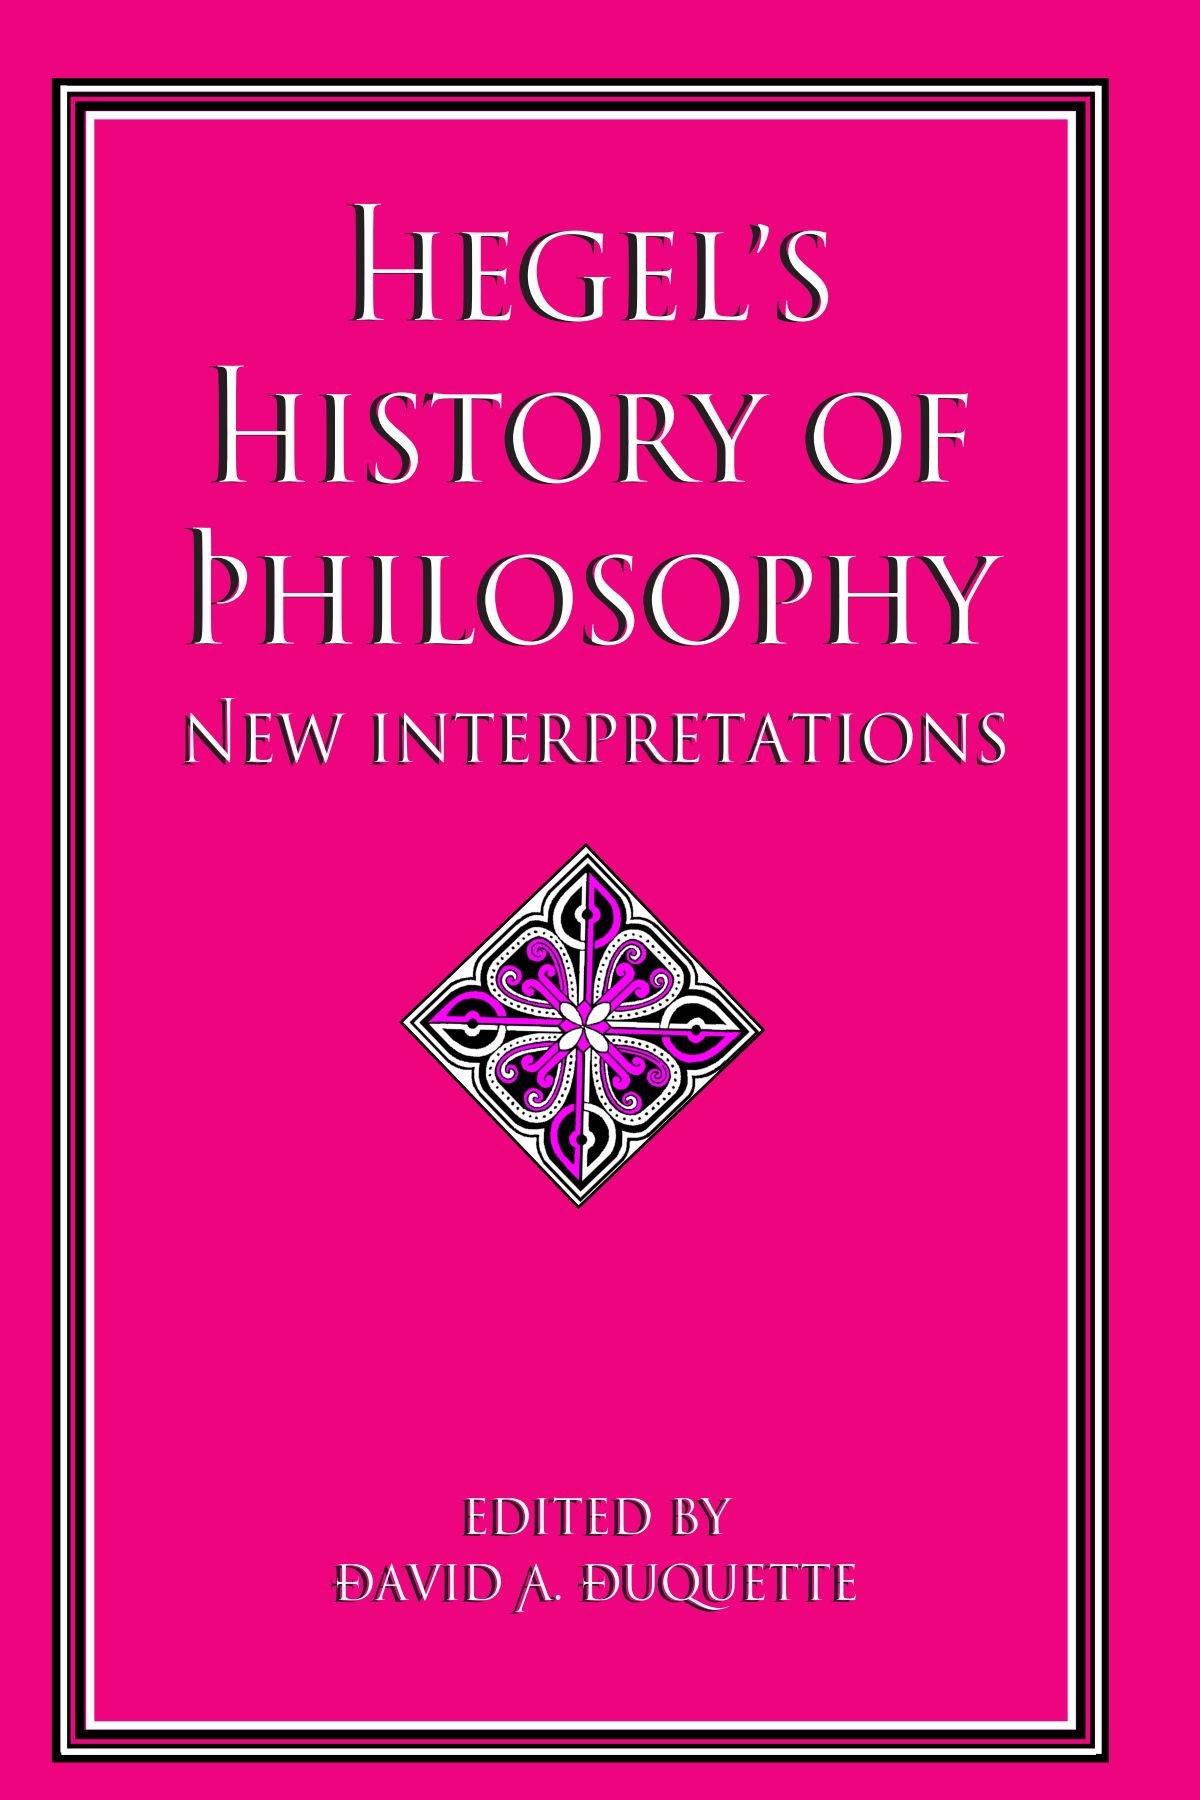 Hegel's History of Philosophy: New Interpretations (SUNY Series in Hegelian Studies) pdf